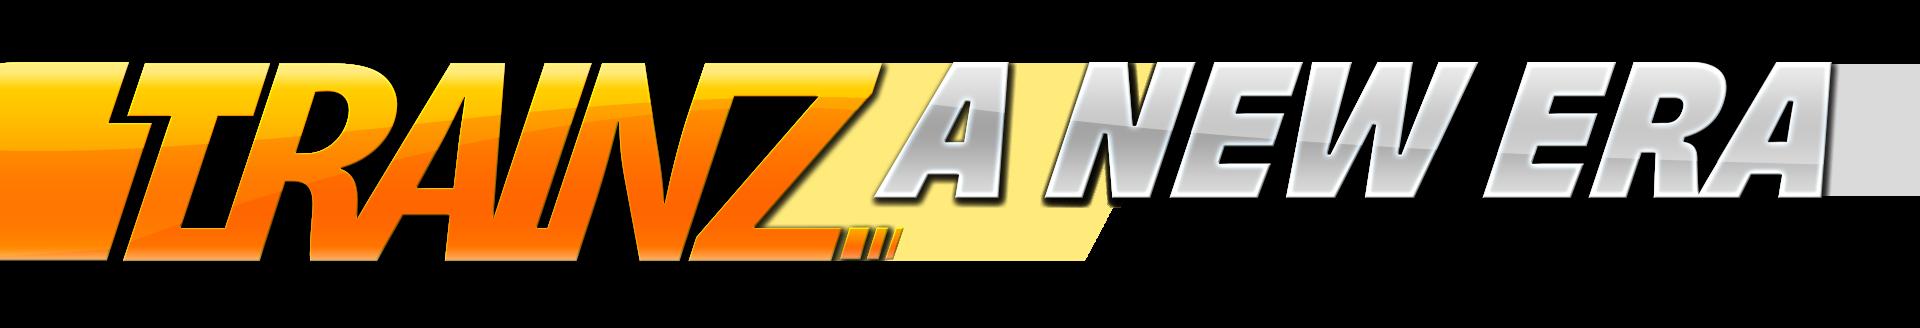 Trainz-A-New-Era-Logo  3c83021a814